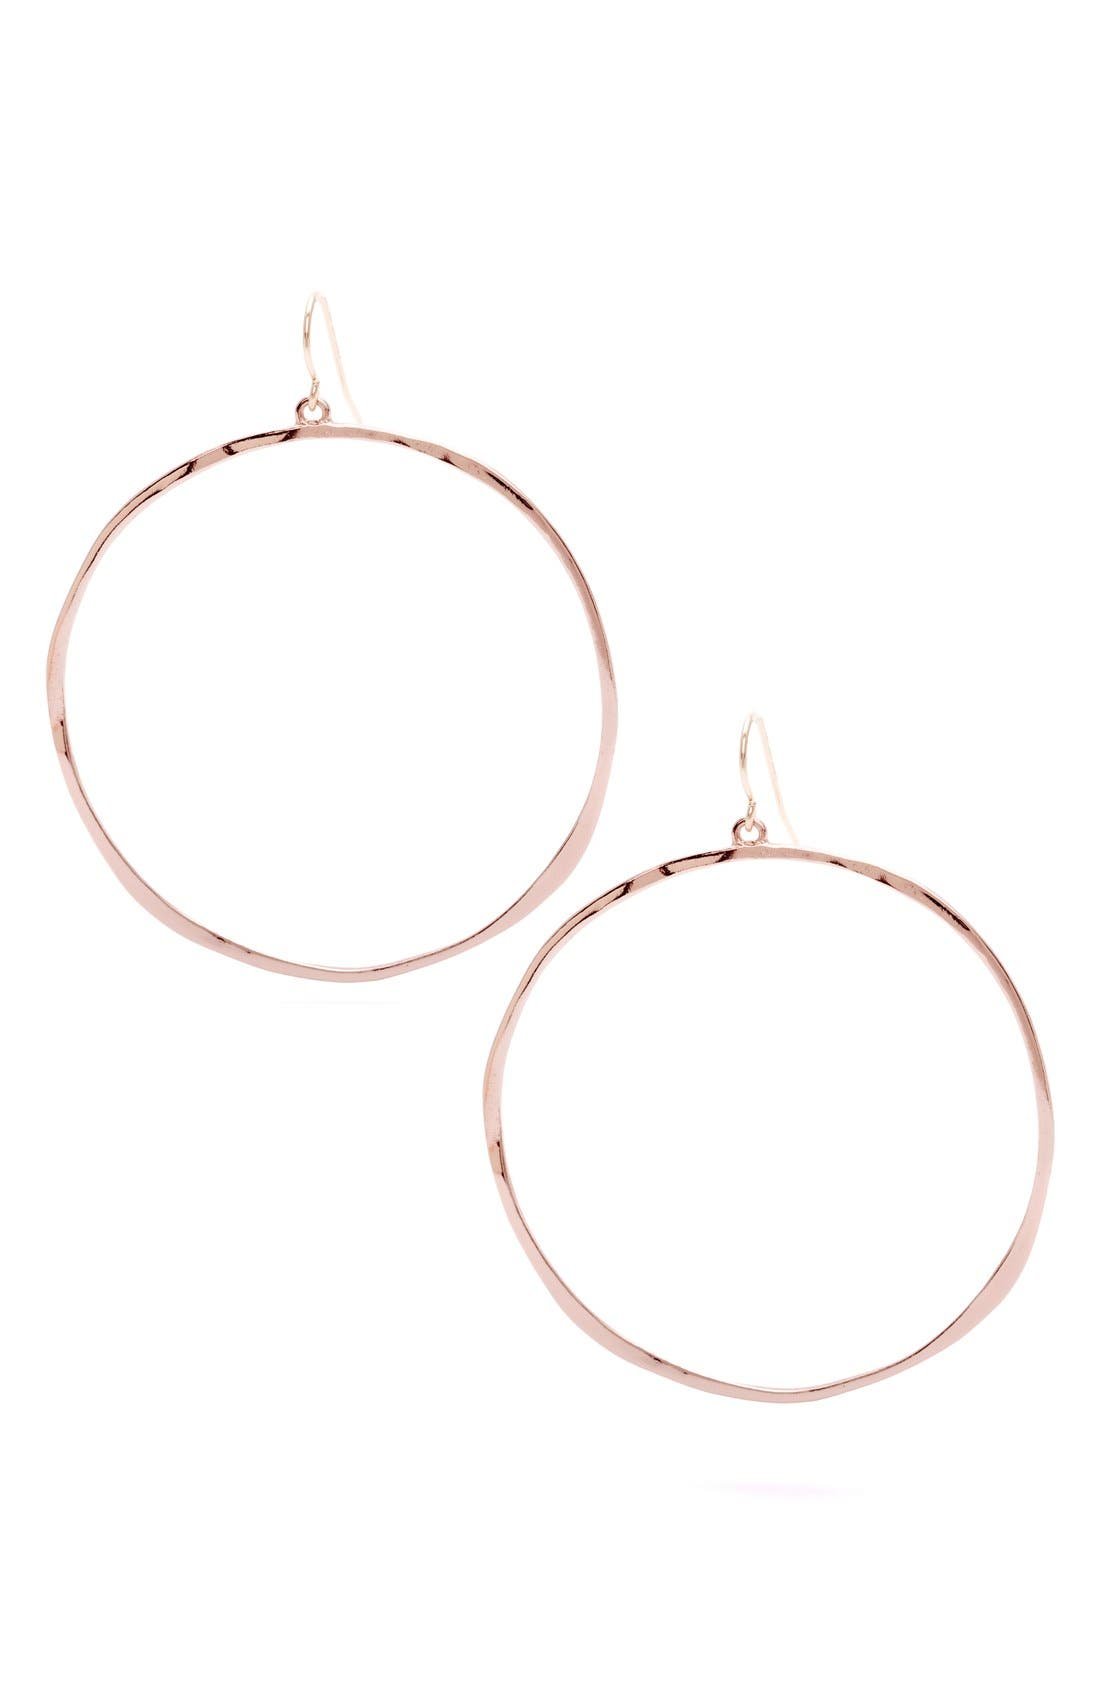 Main Image - gorjana G-Ring Frontal Hoop Earrings